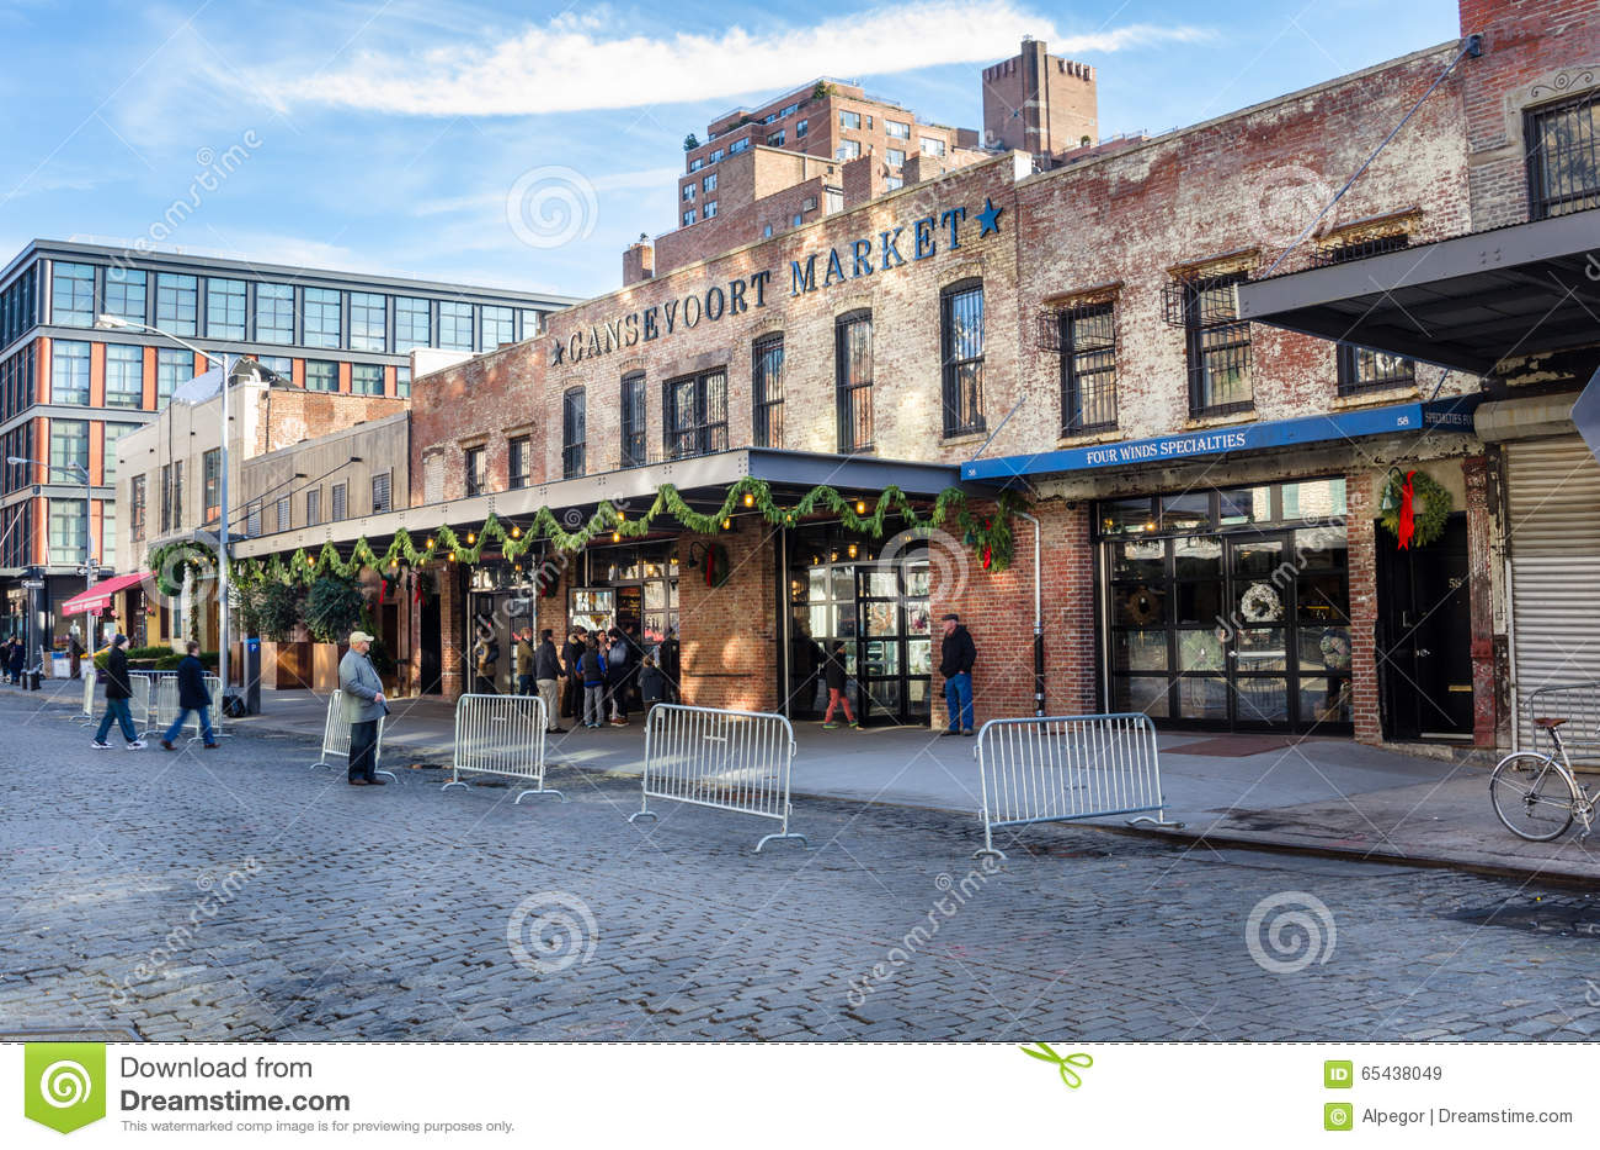 Gansevoort Market exterior of gansevoort market editorial stock image - image: 65438049